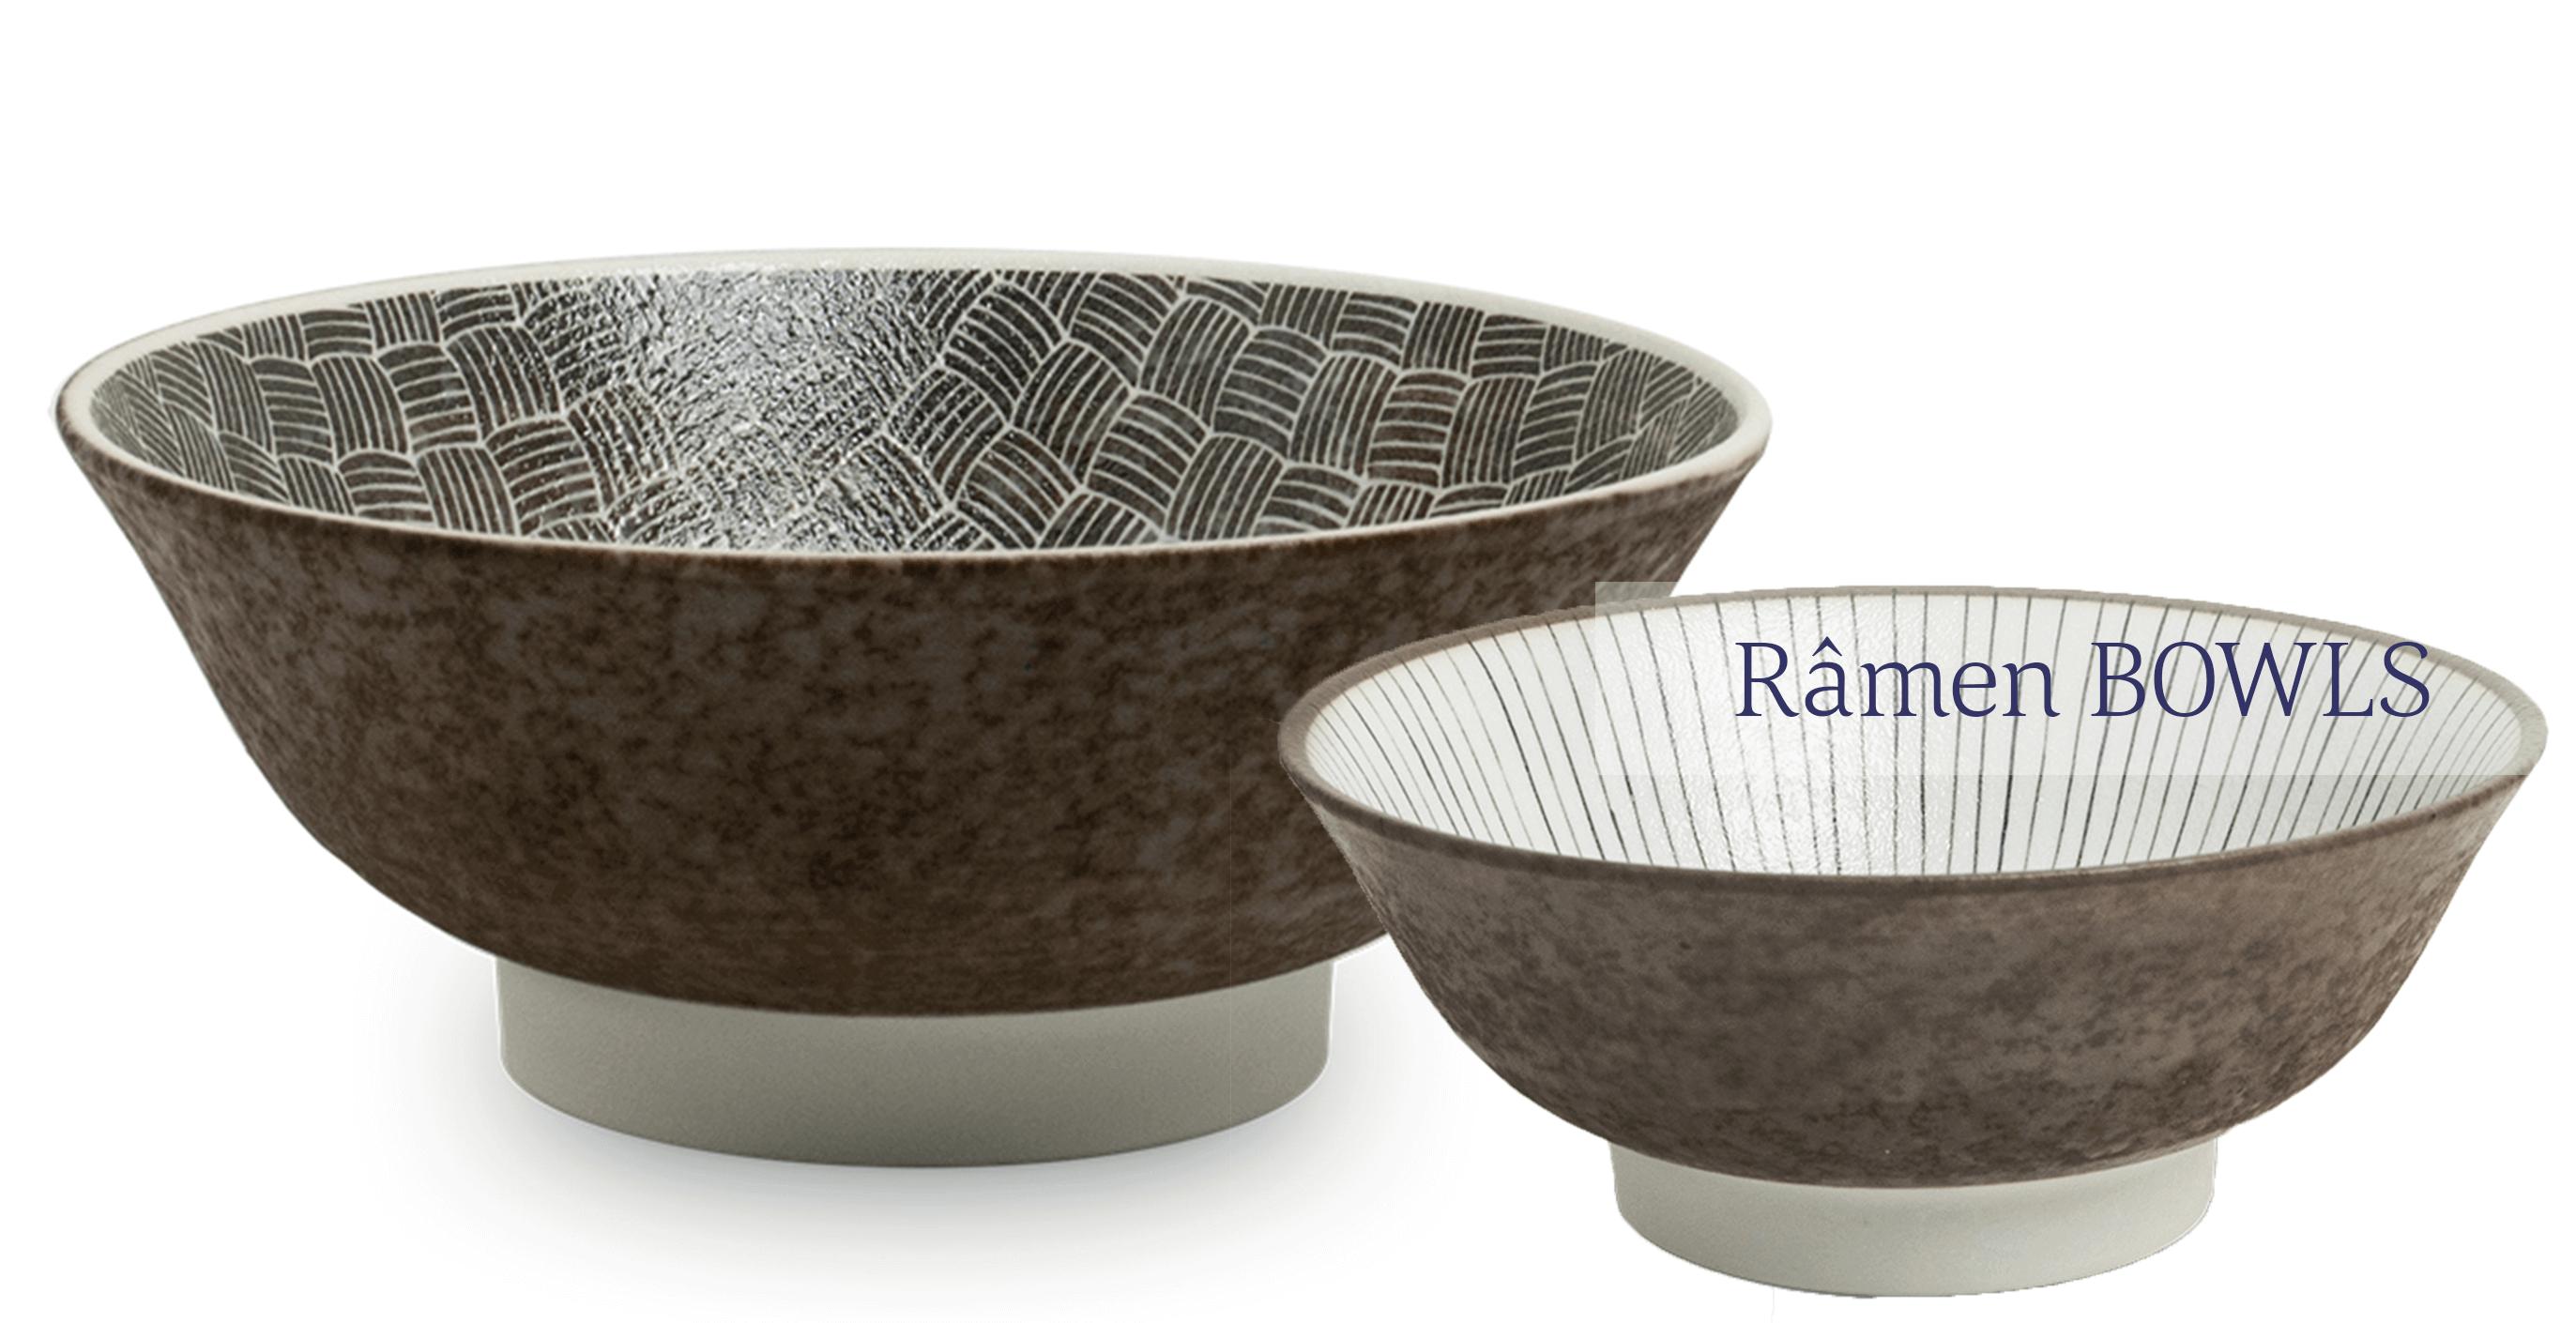 Râmen bowls